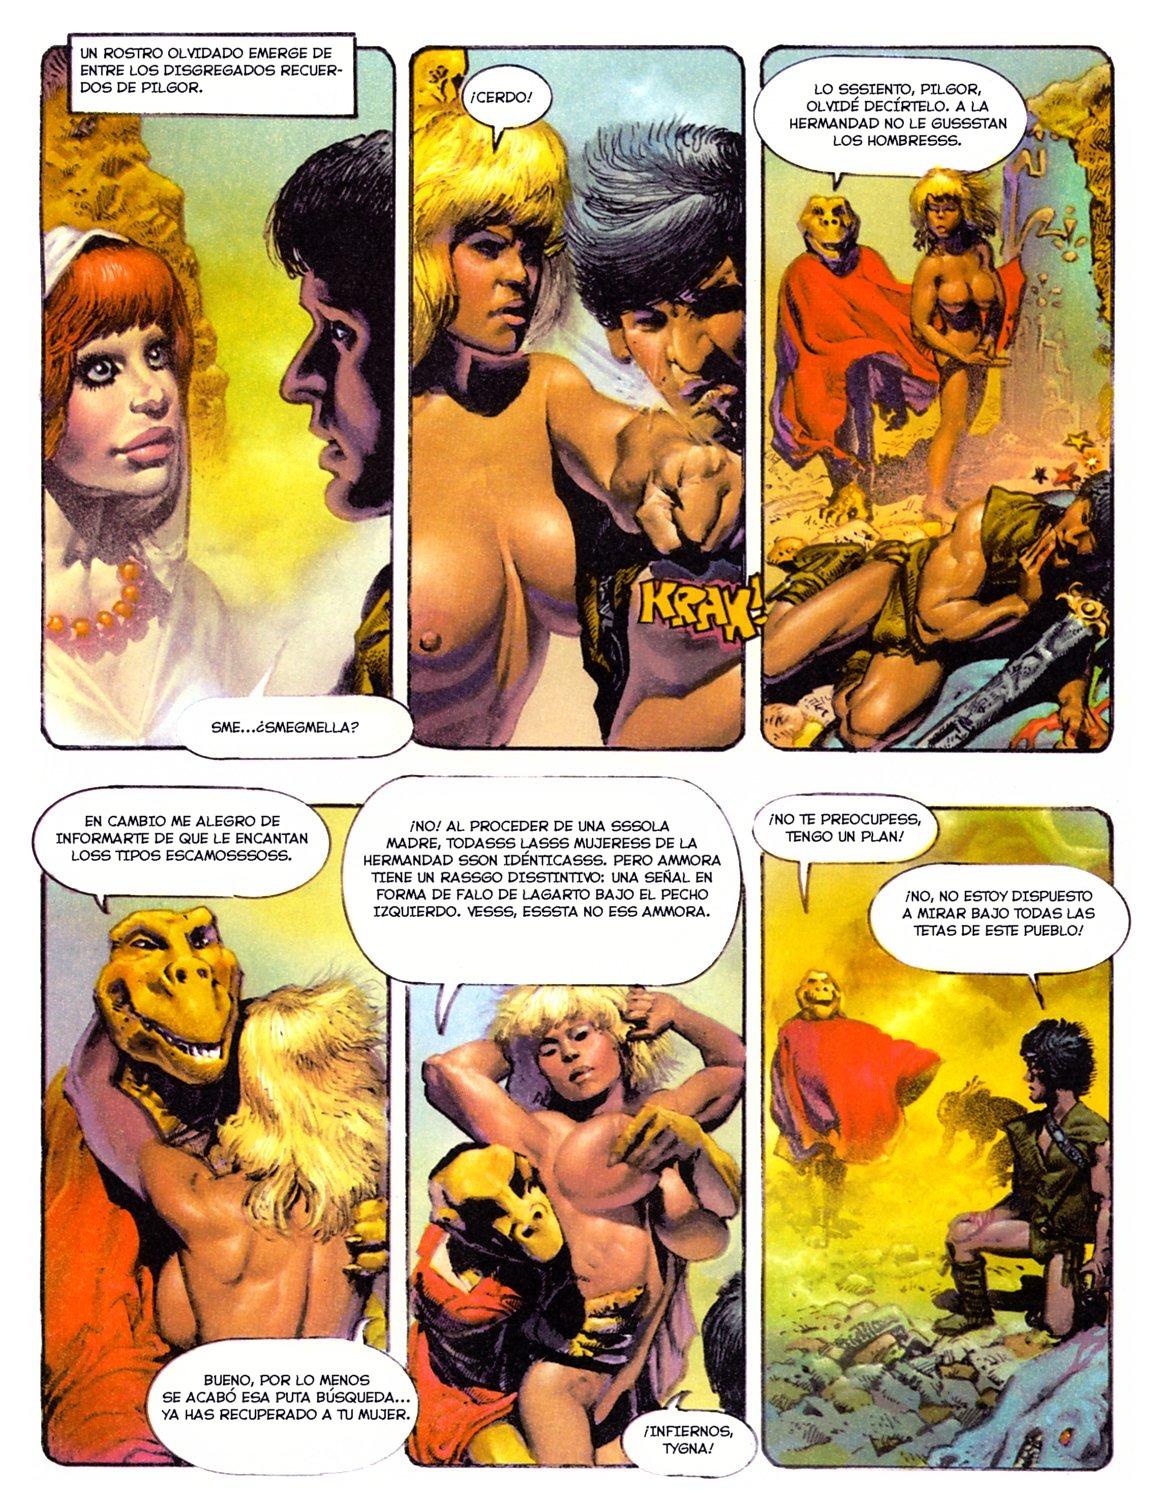 Alan ford gruppo t n t ubc enciclopedia online del fumetto - Comic Books Archive The Apricity Forum A European Cultural Community